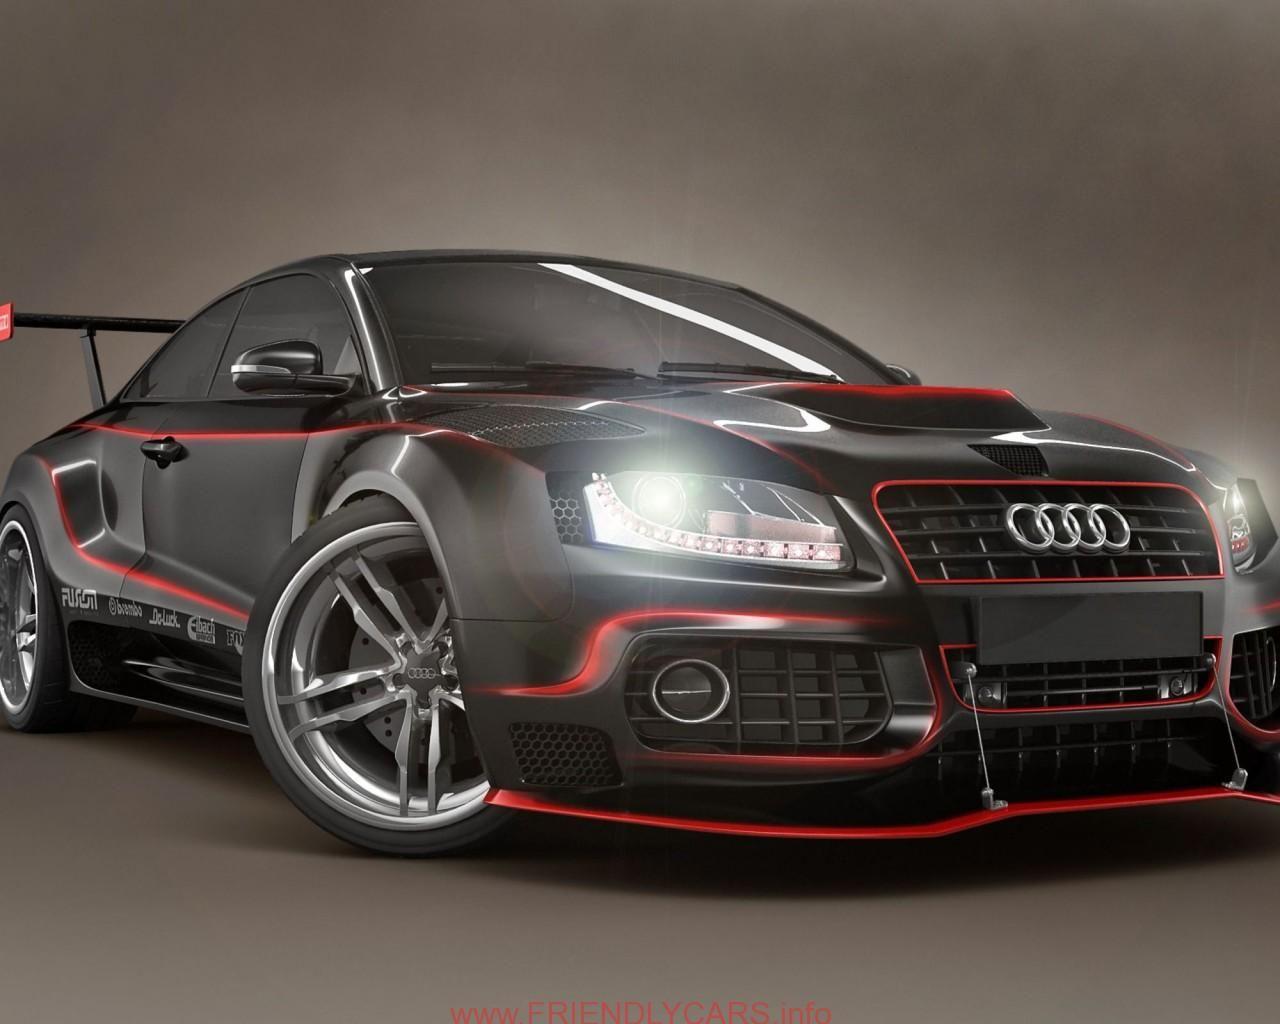 Audi Audi A5 Black Wallpaper Car Images Hd Alifiah Sites